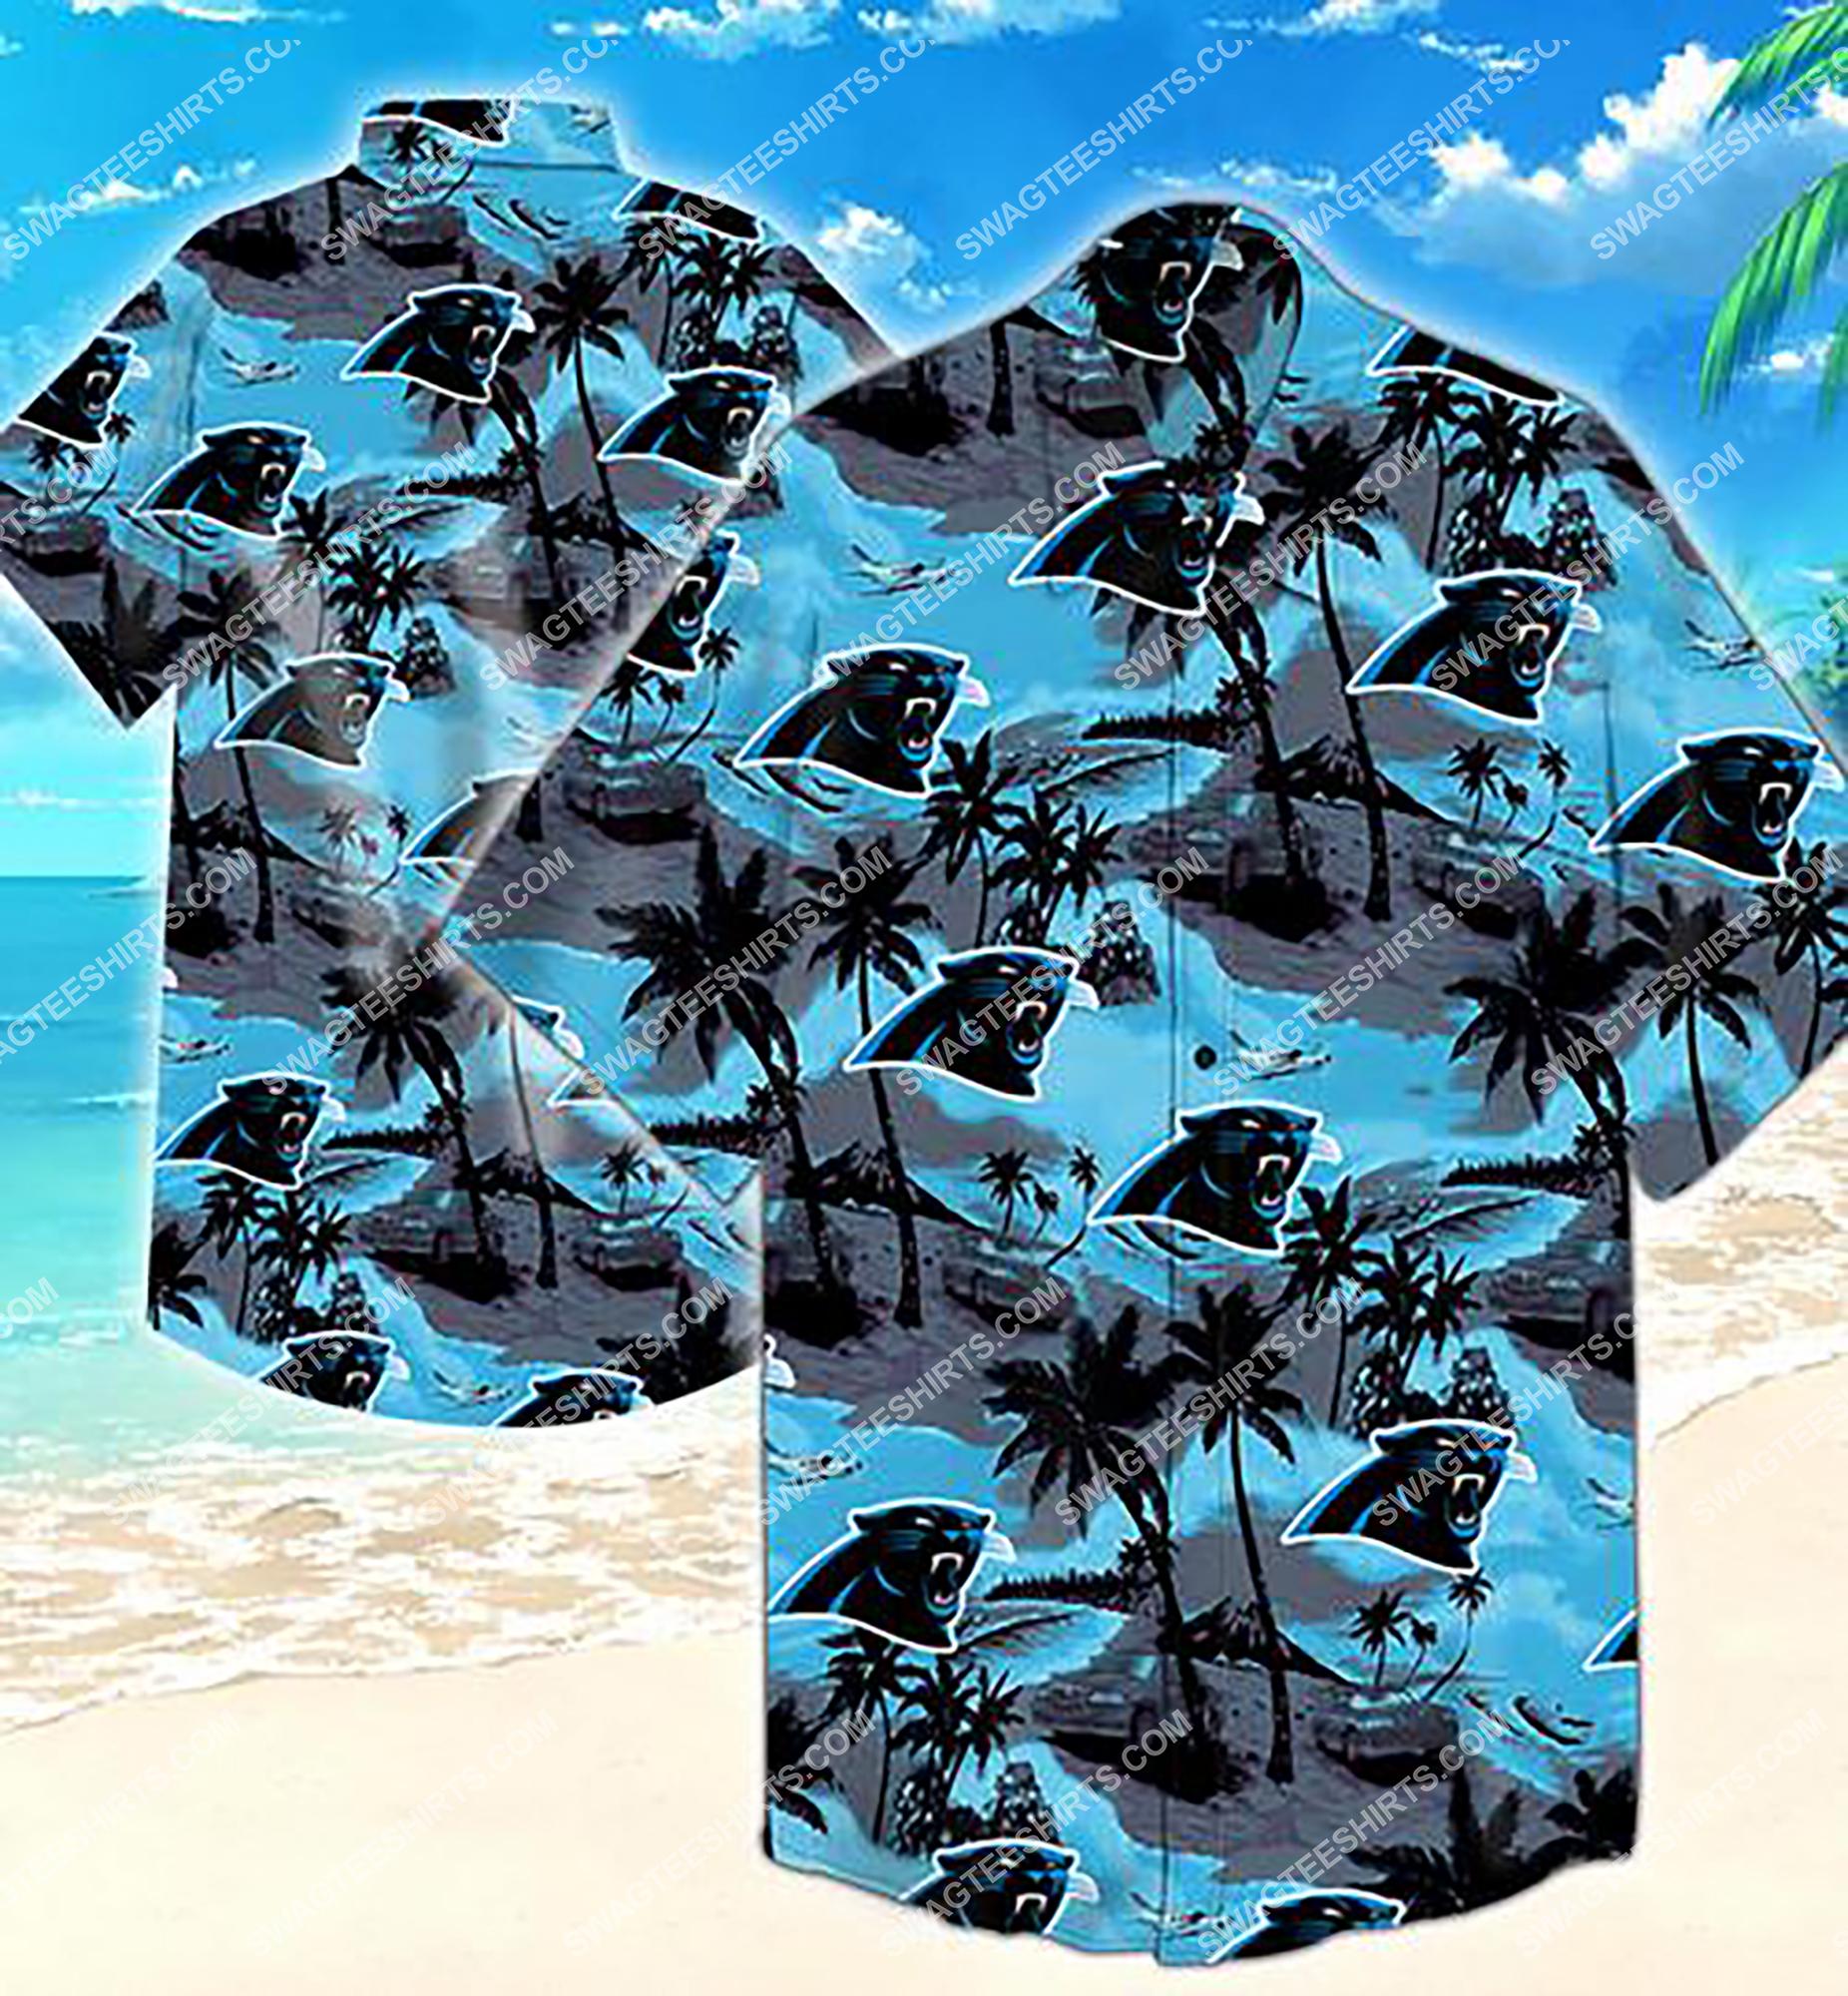 tropical flower carolina panthers team summer hawaiian shirt 2 - Copy (3)